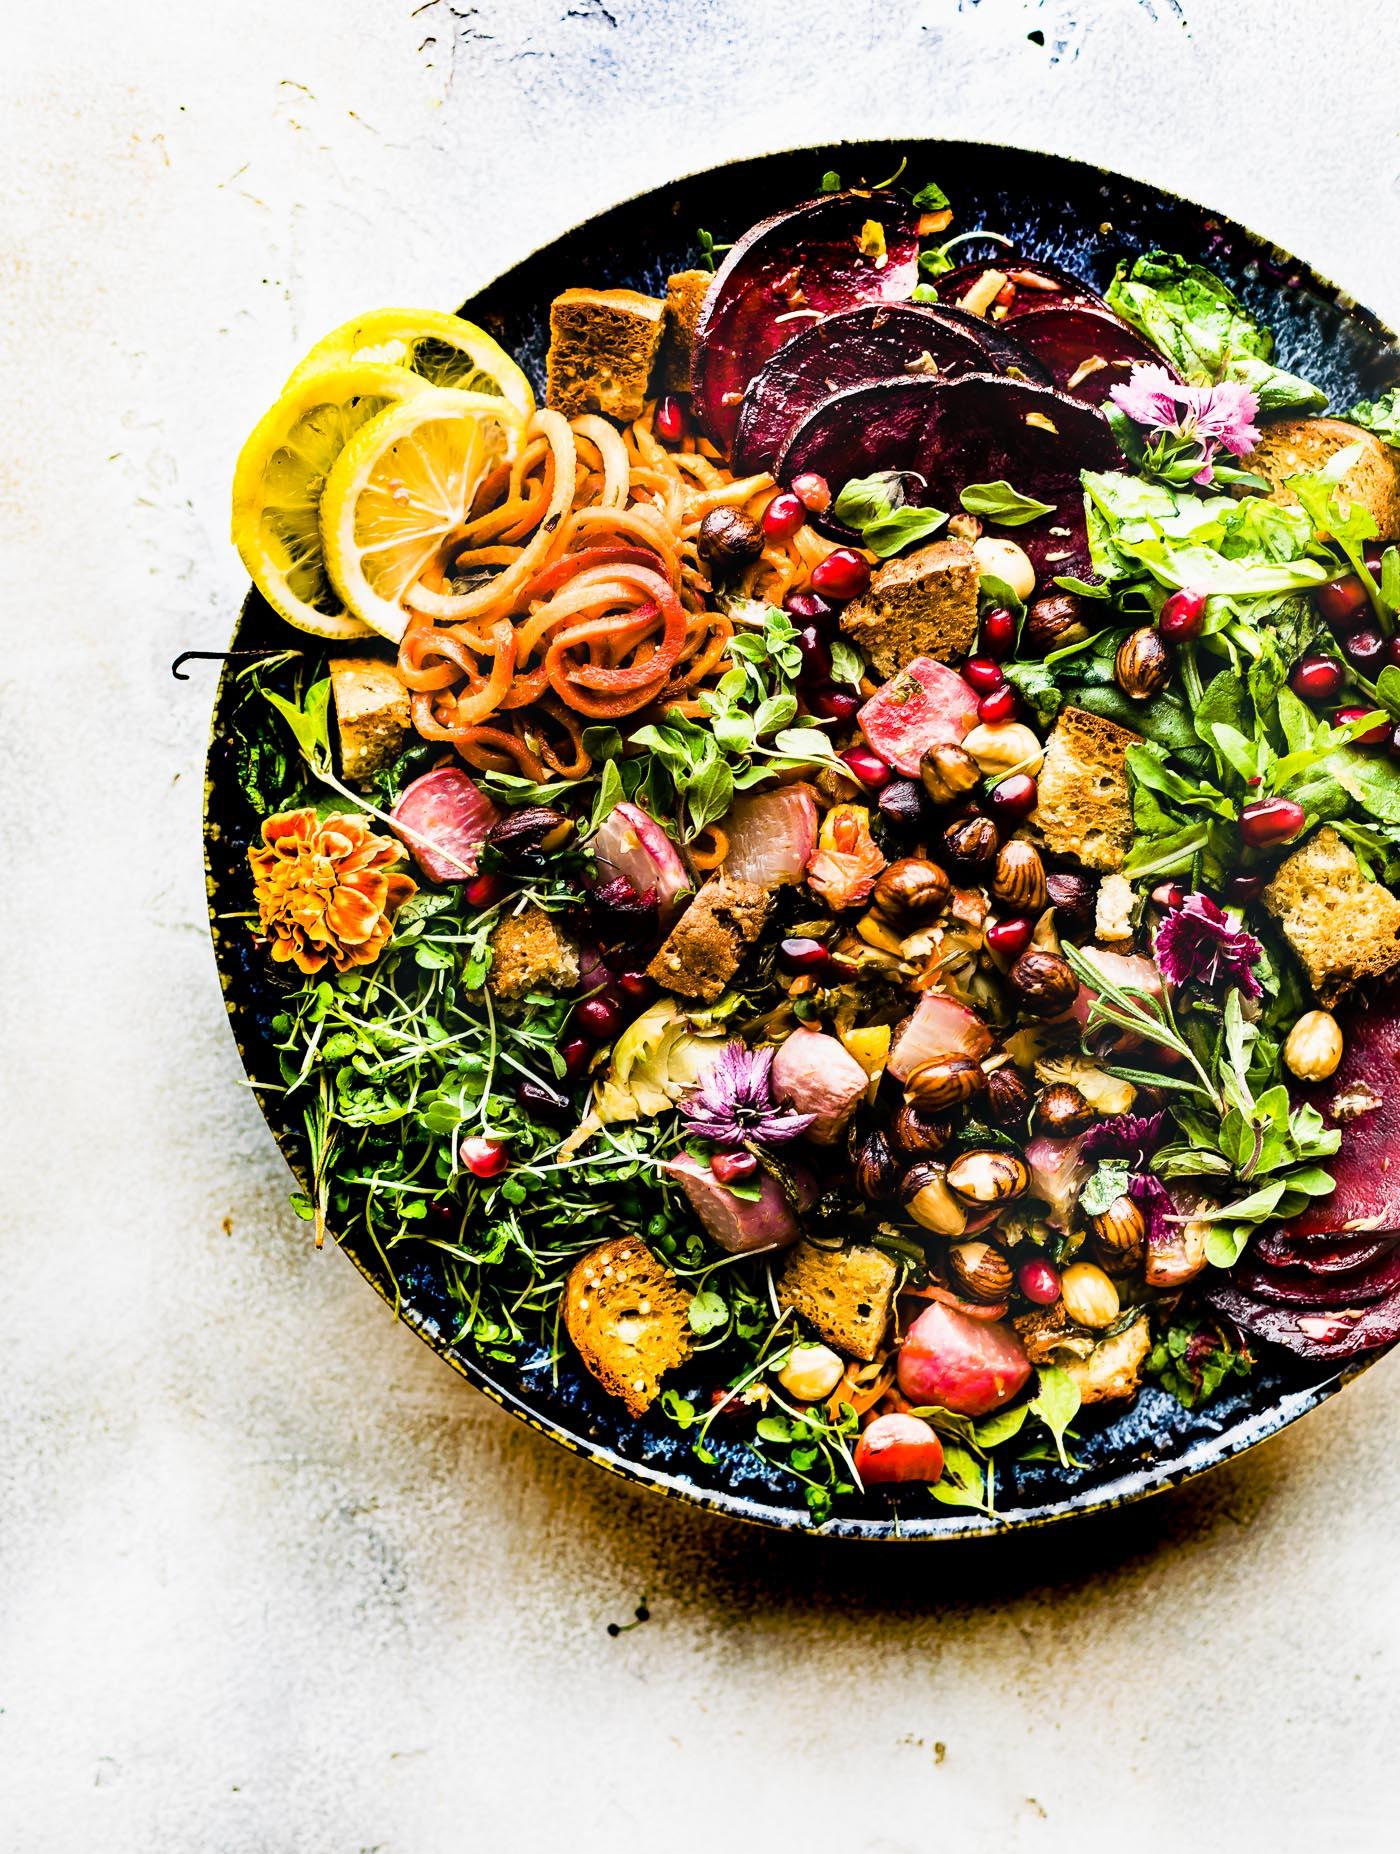 Roasted Vegetable Panzanella Fall Salad